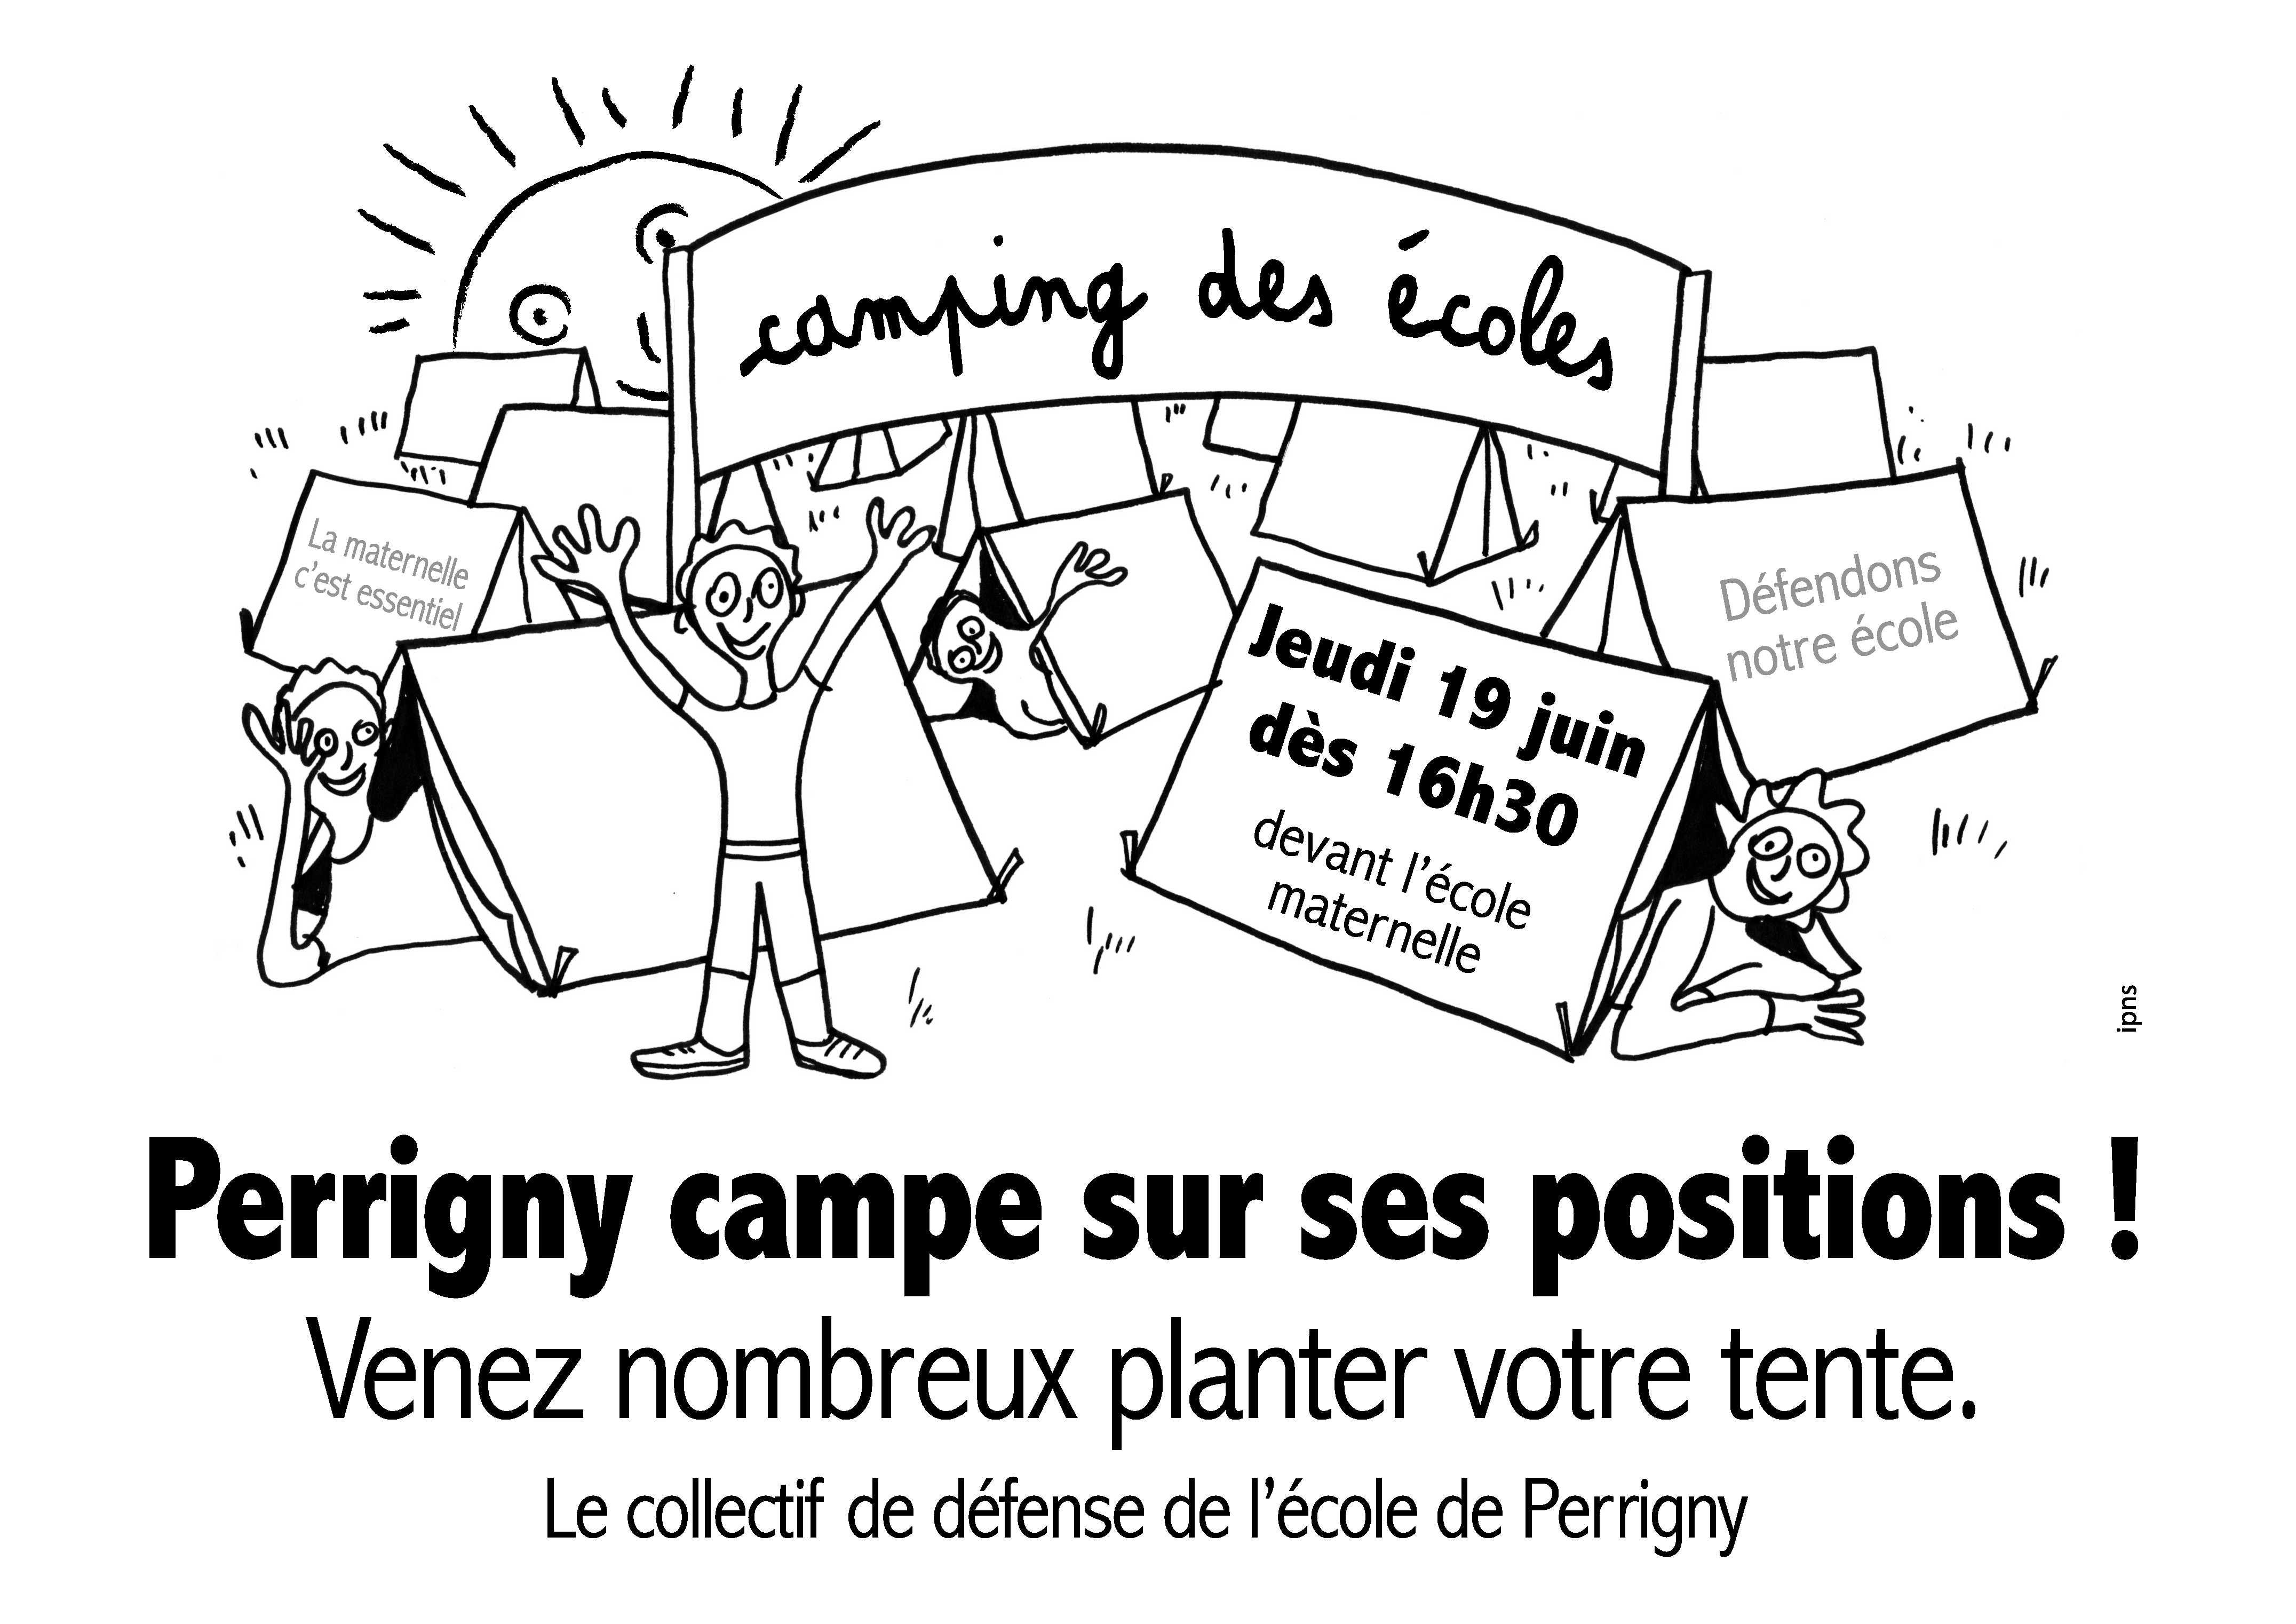 campingcoletract02.jpg